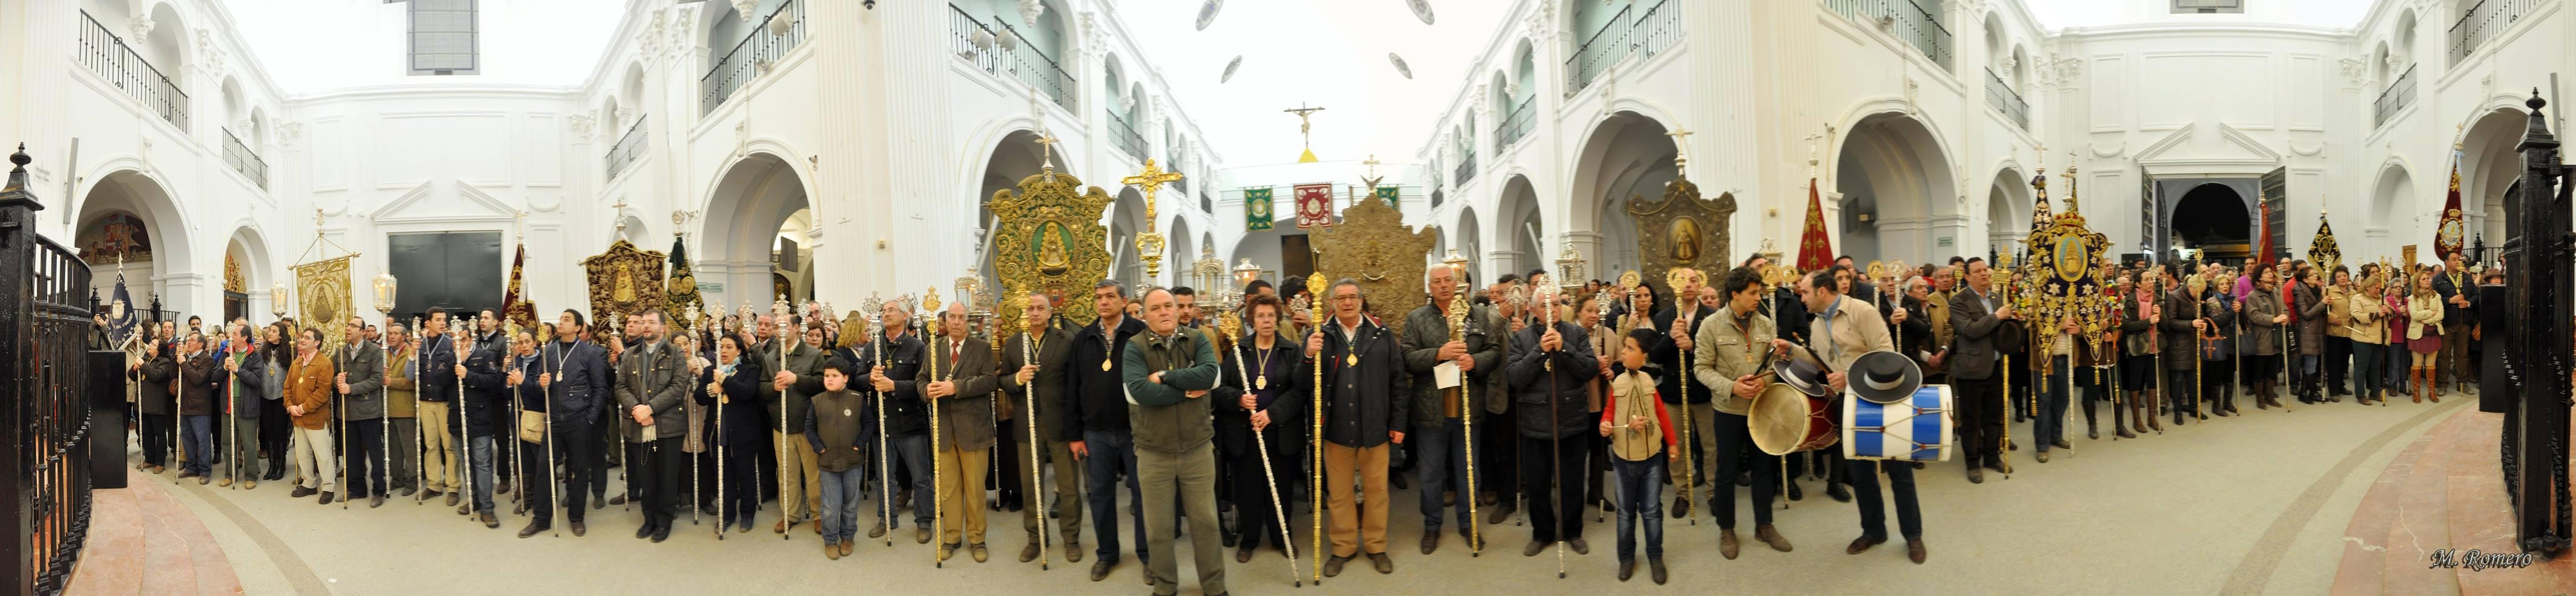 5135-rosario-hermandades-1-03-2014-57